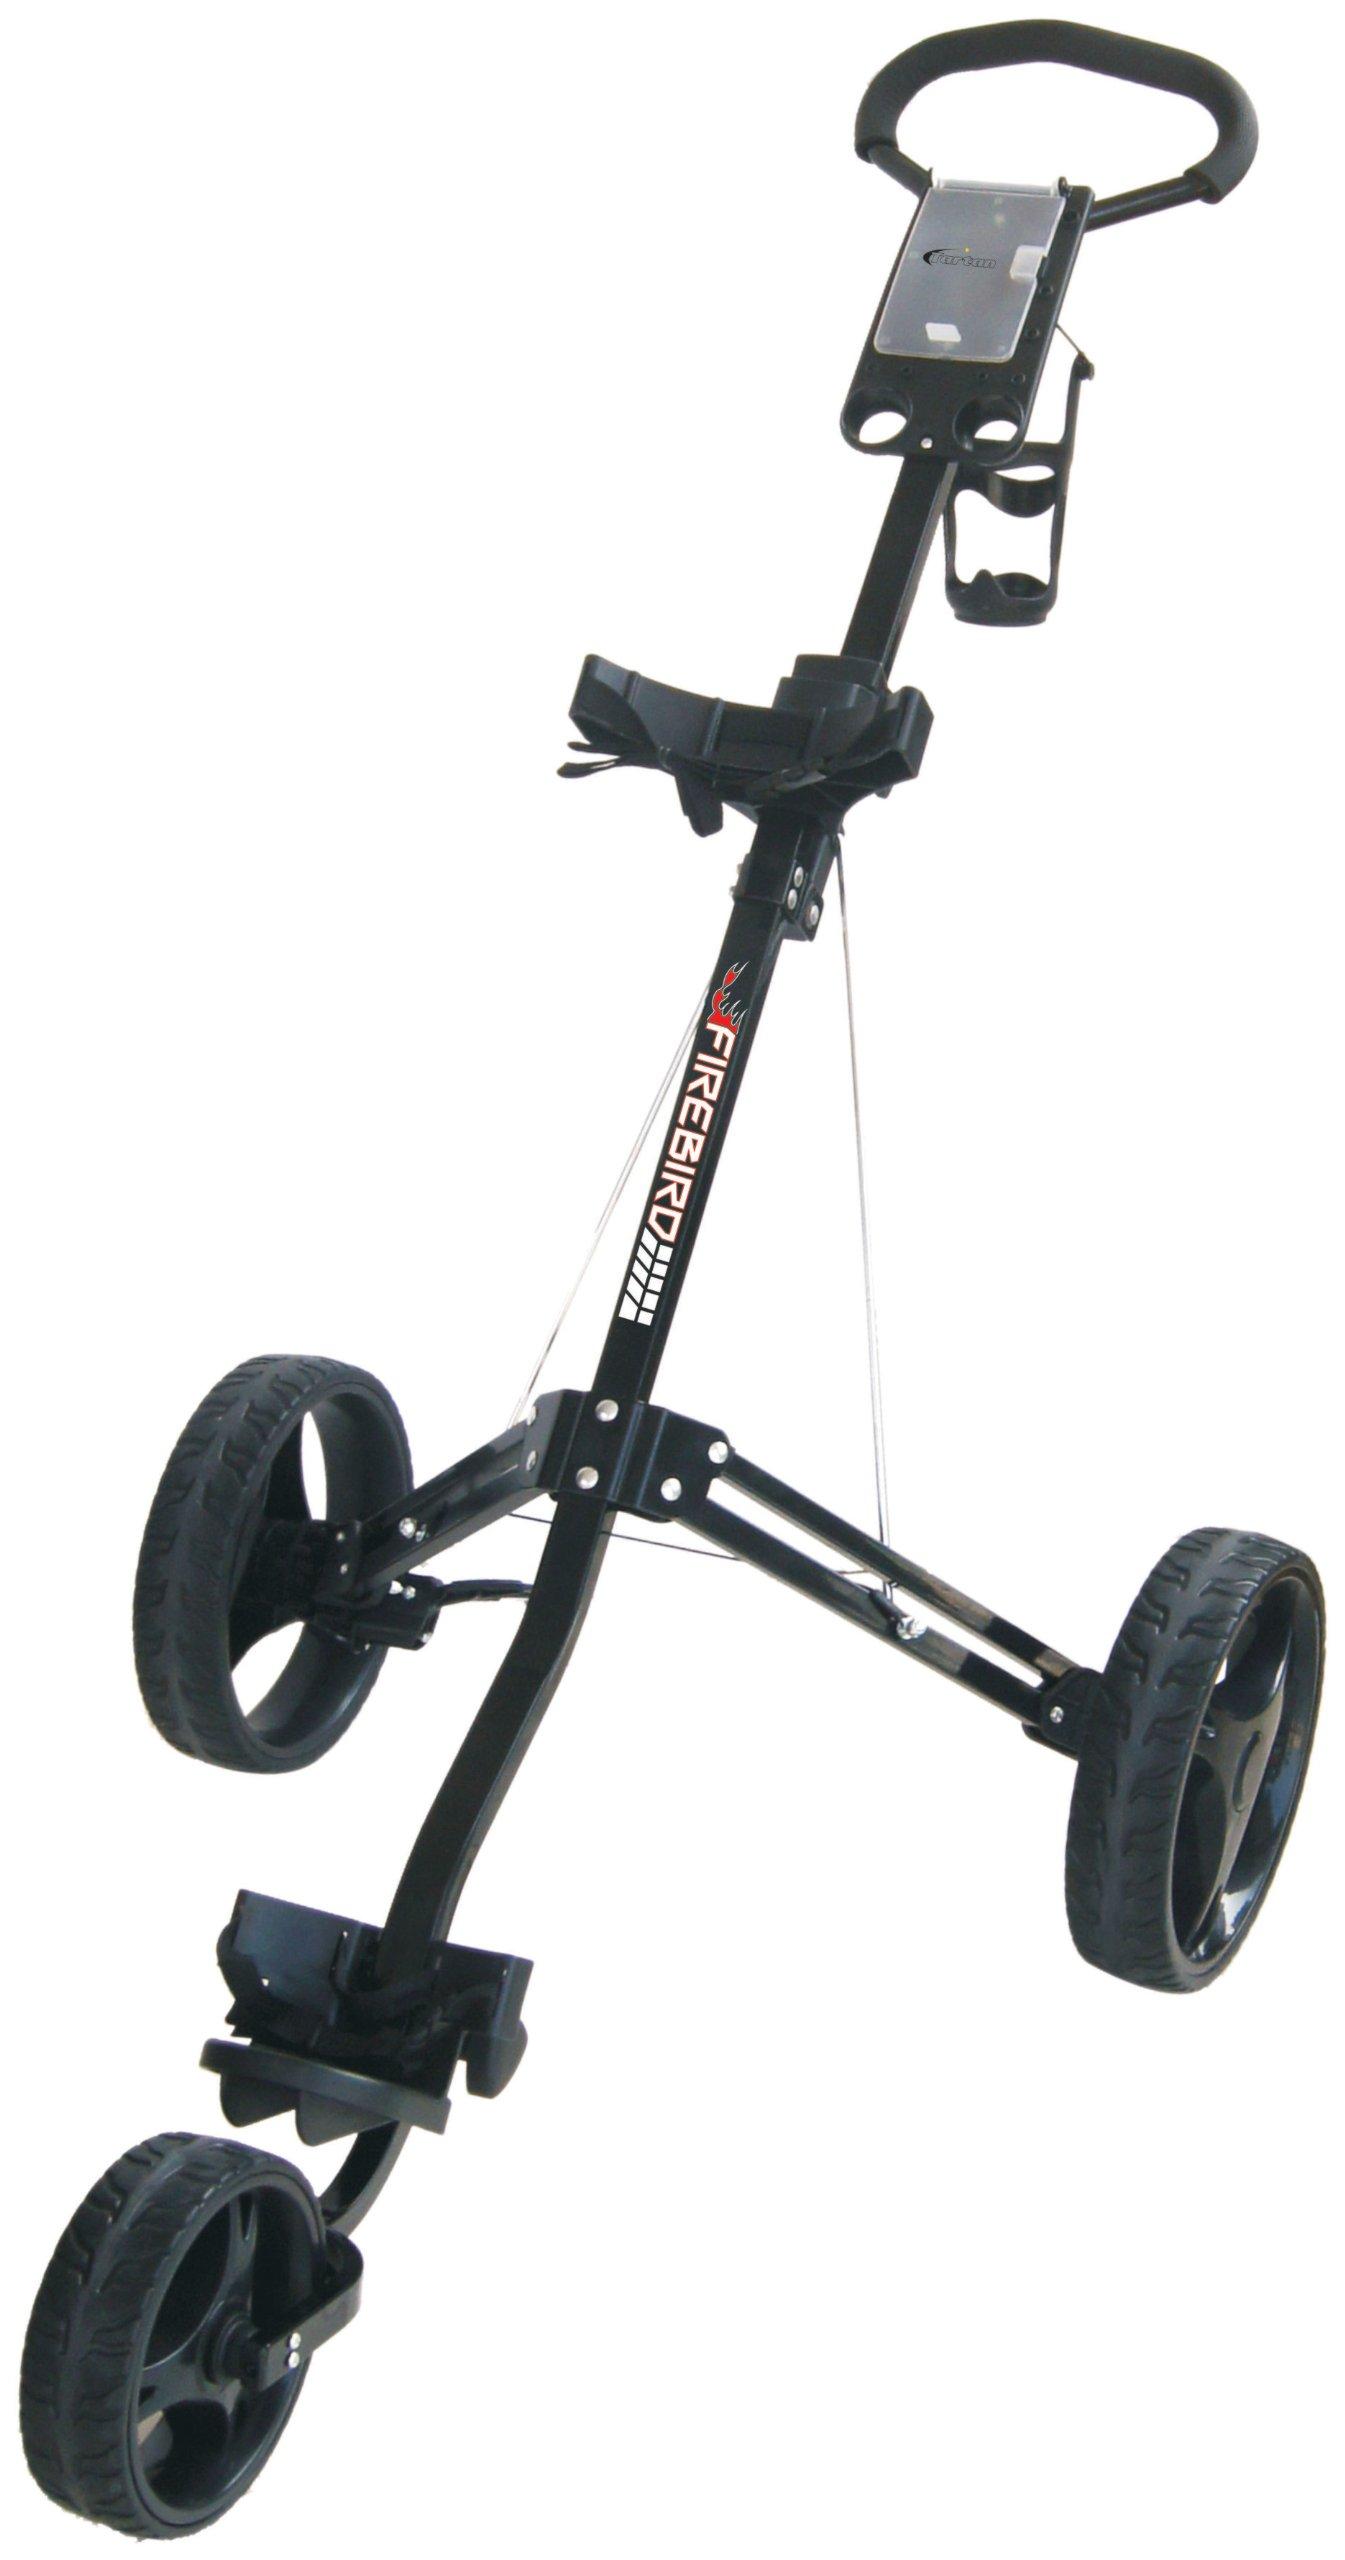 Tartan Firebird Three Wheel Golf Cart (Black)